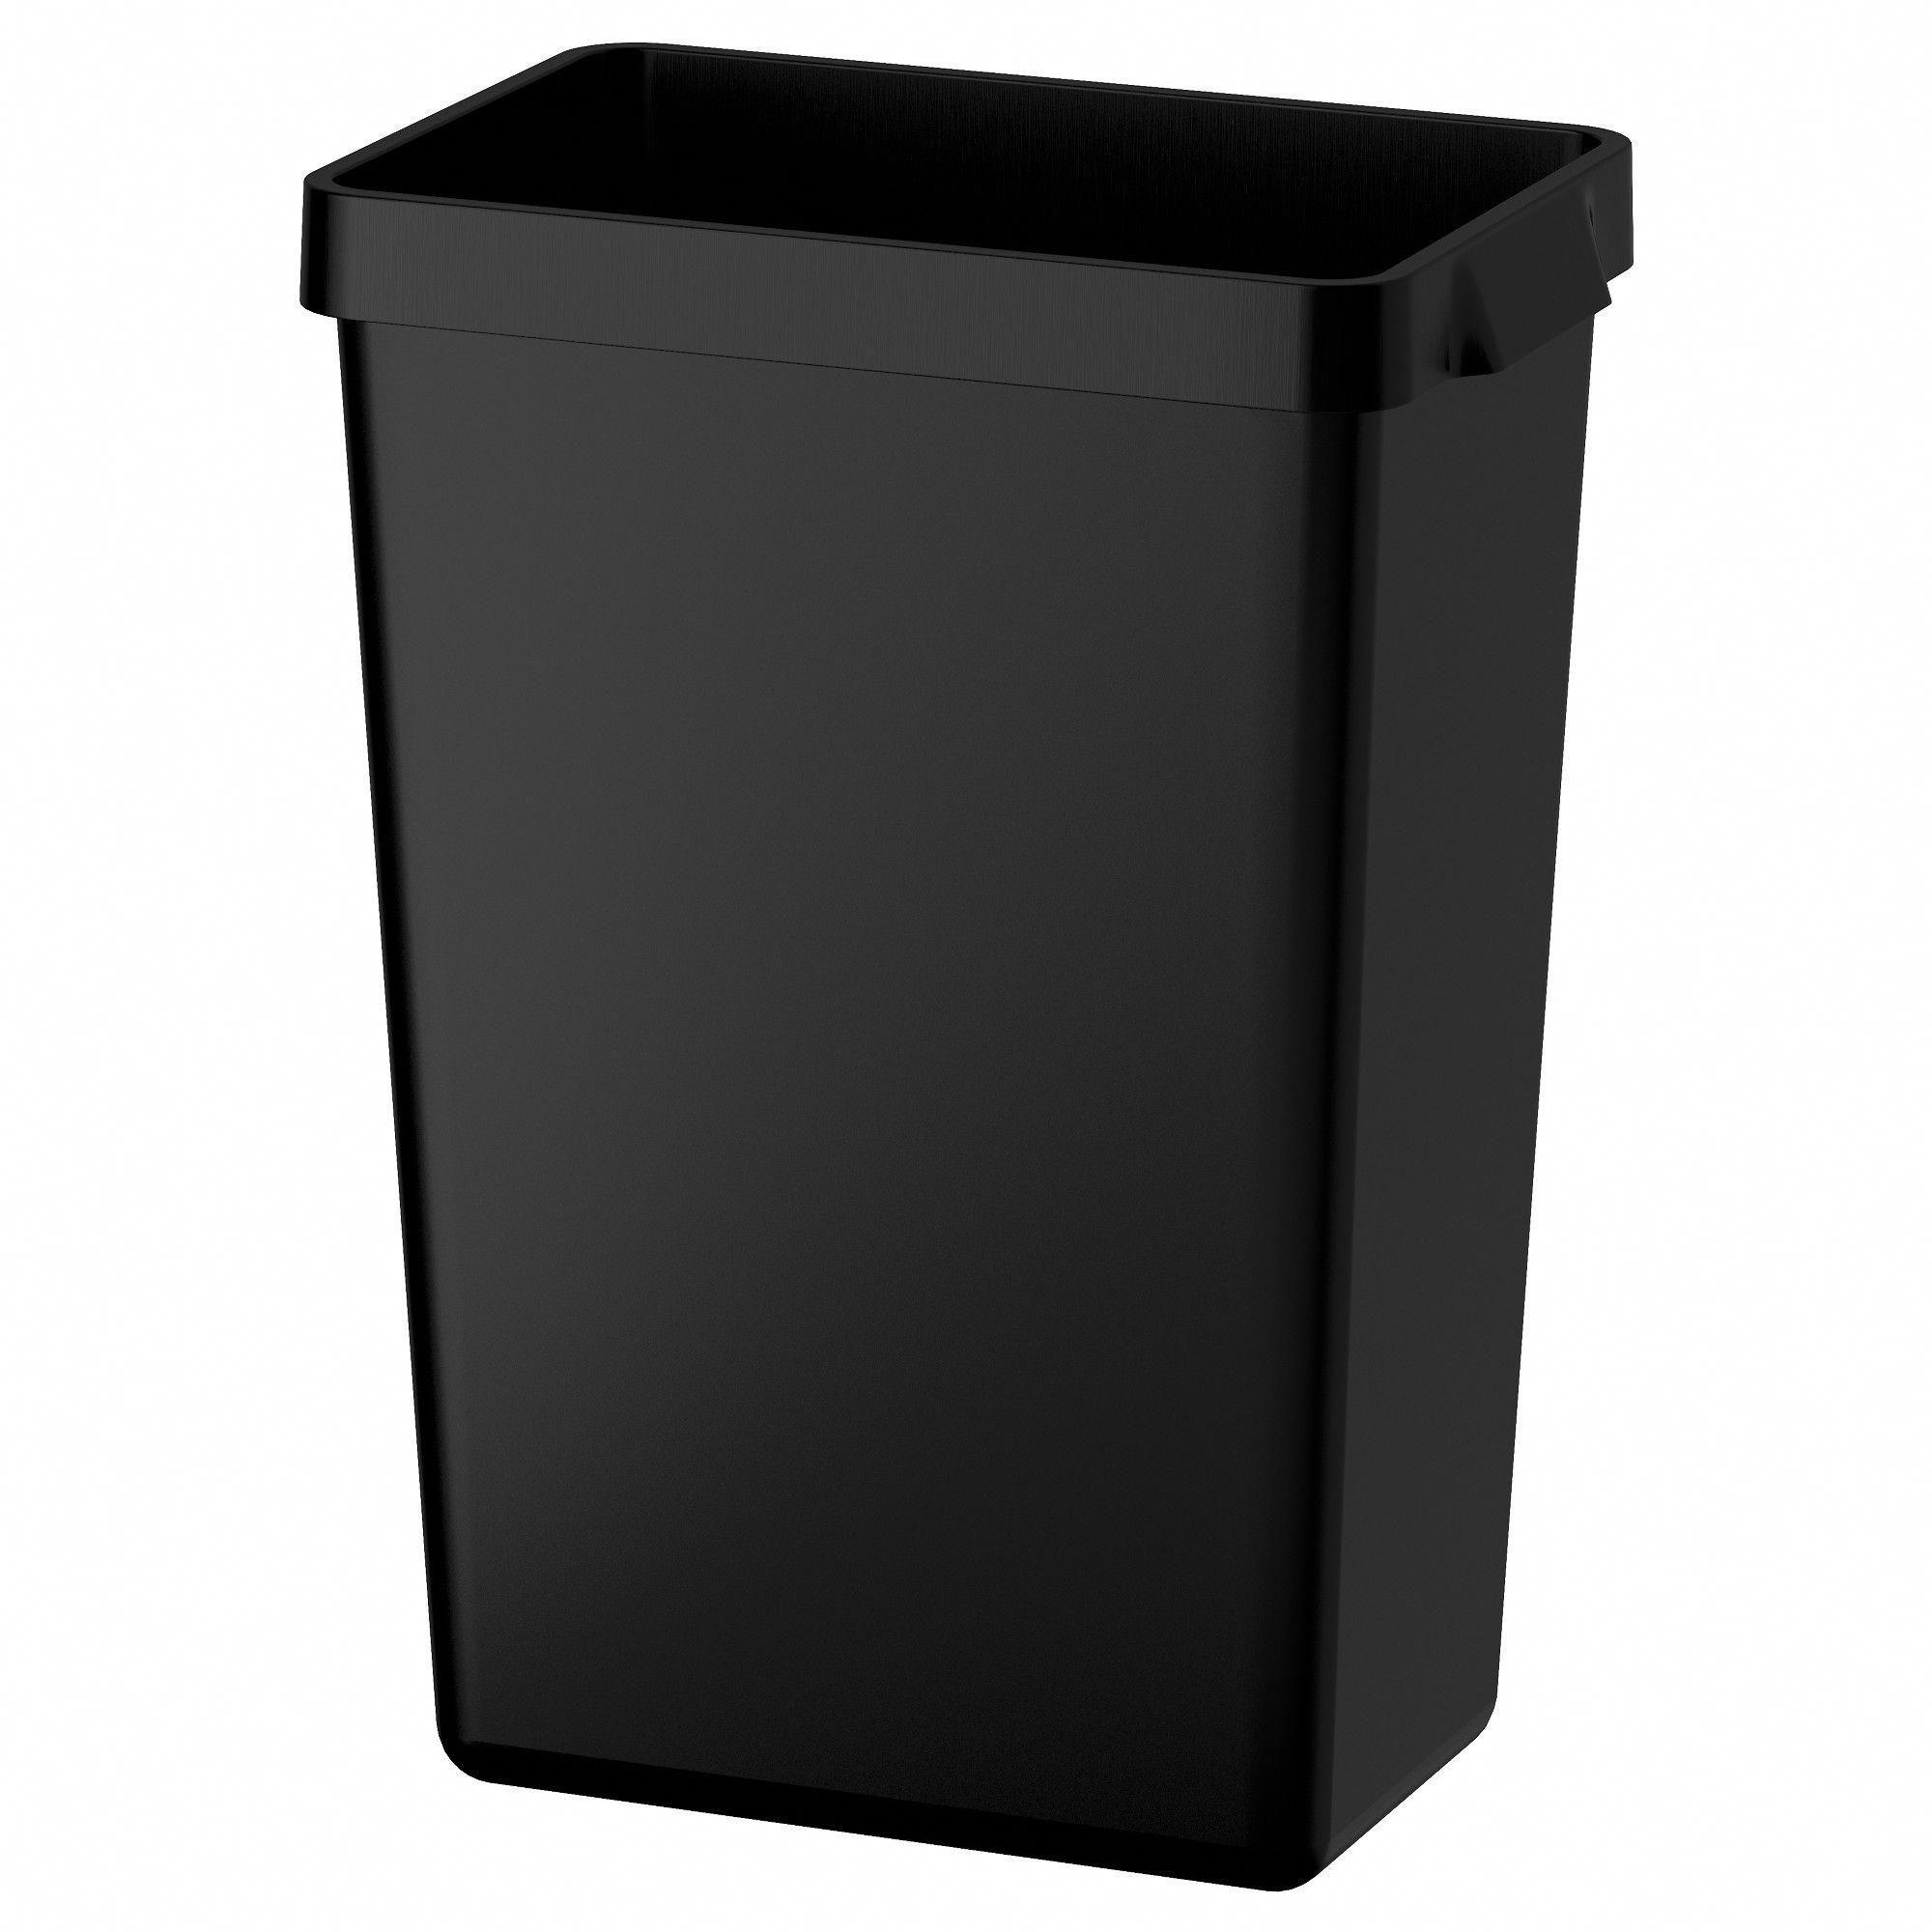 Ikea variera recycling bin black decorating and decor